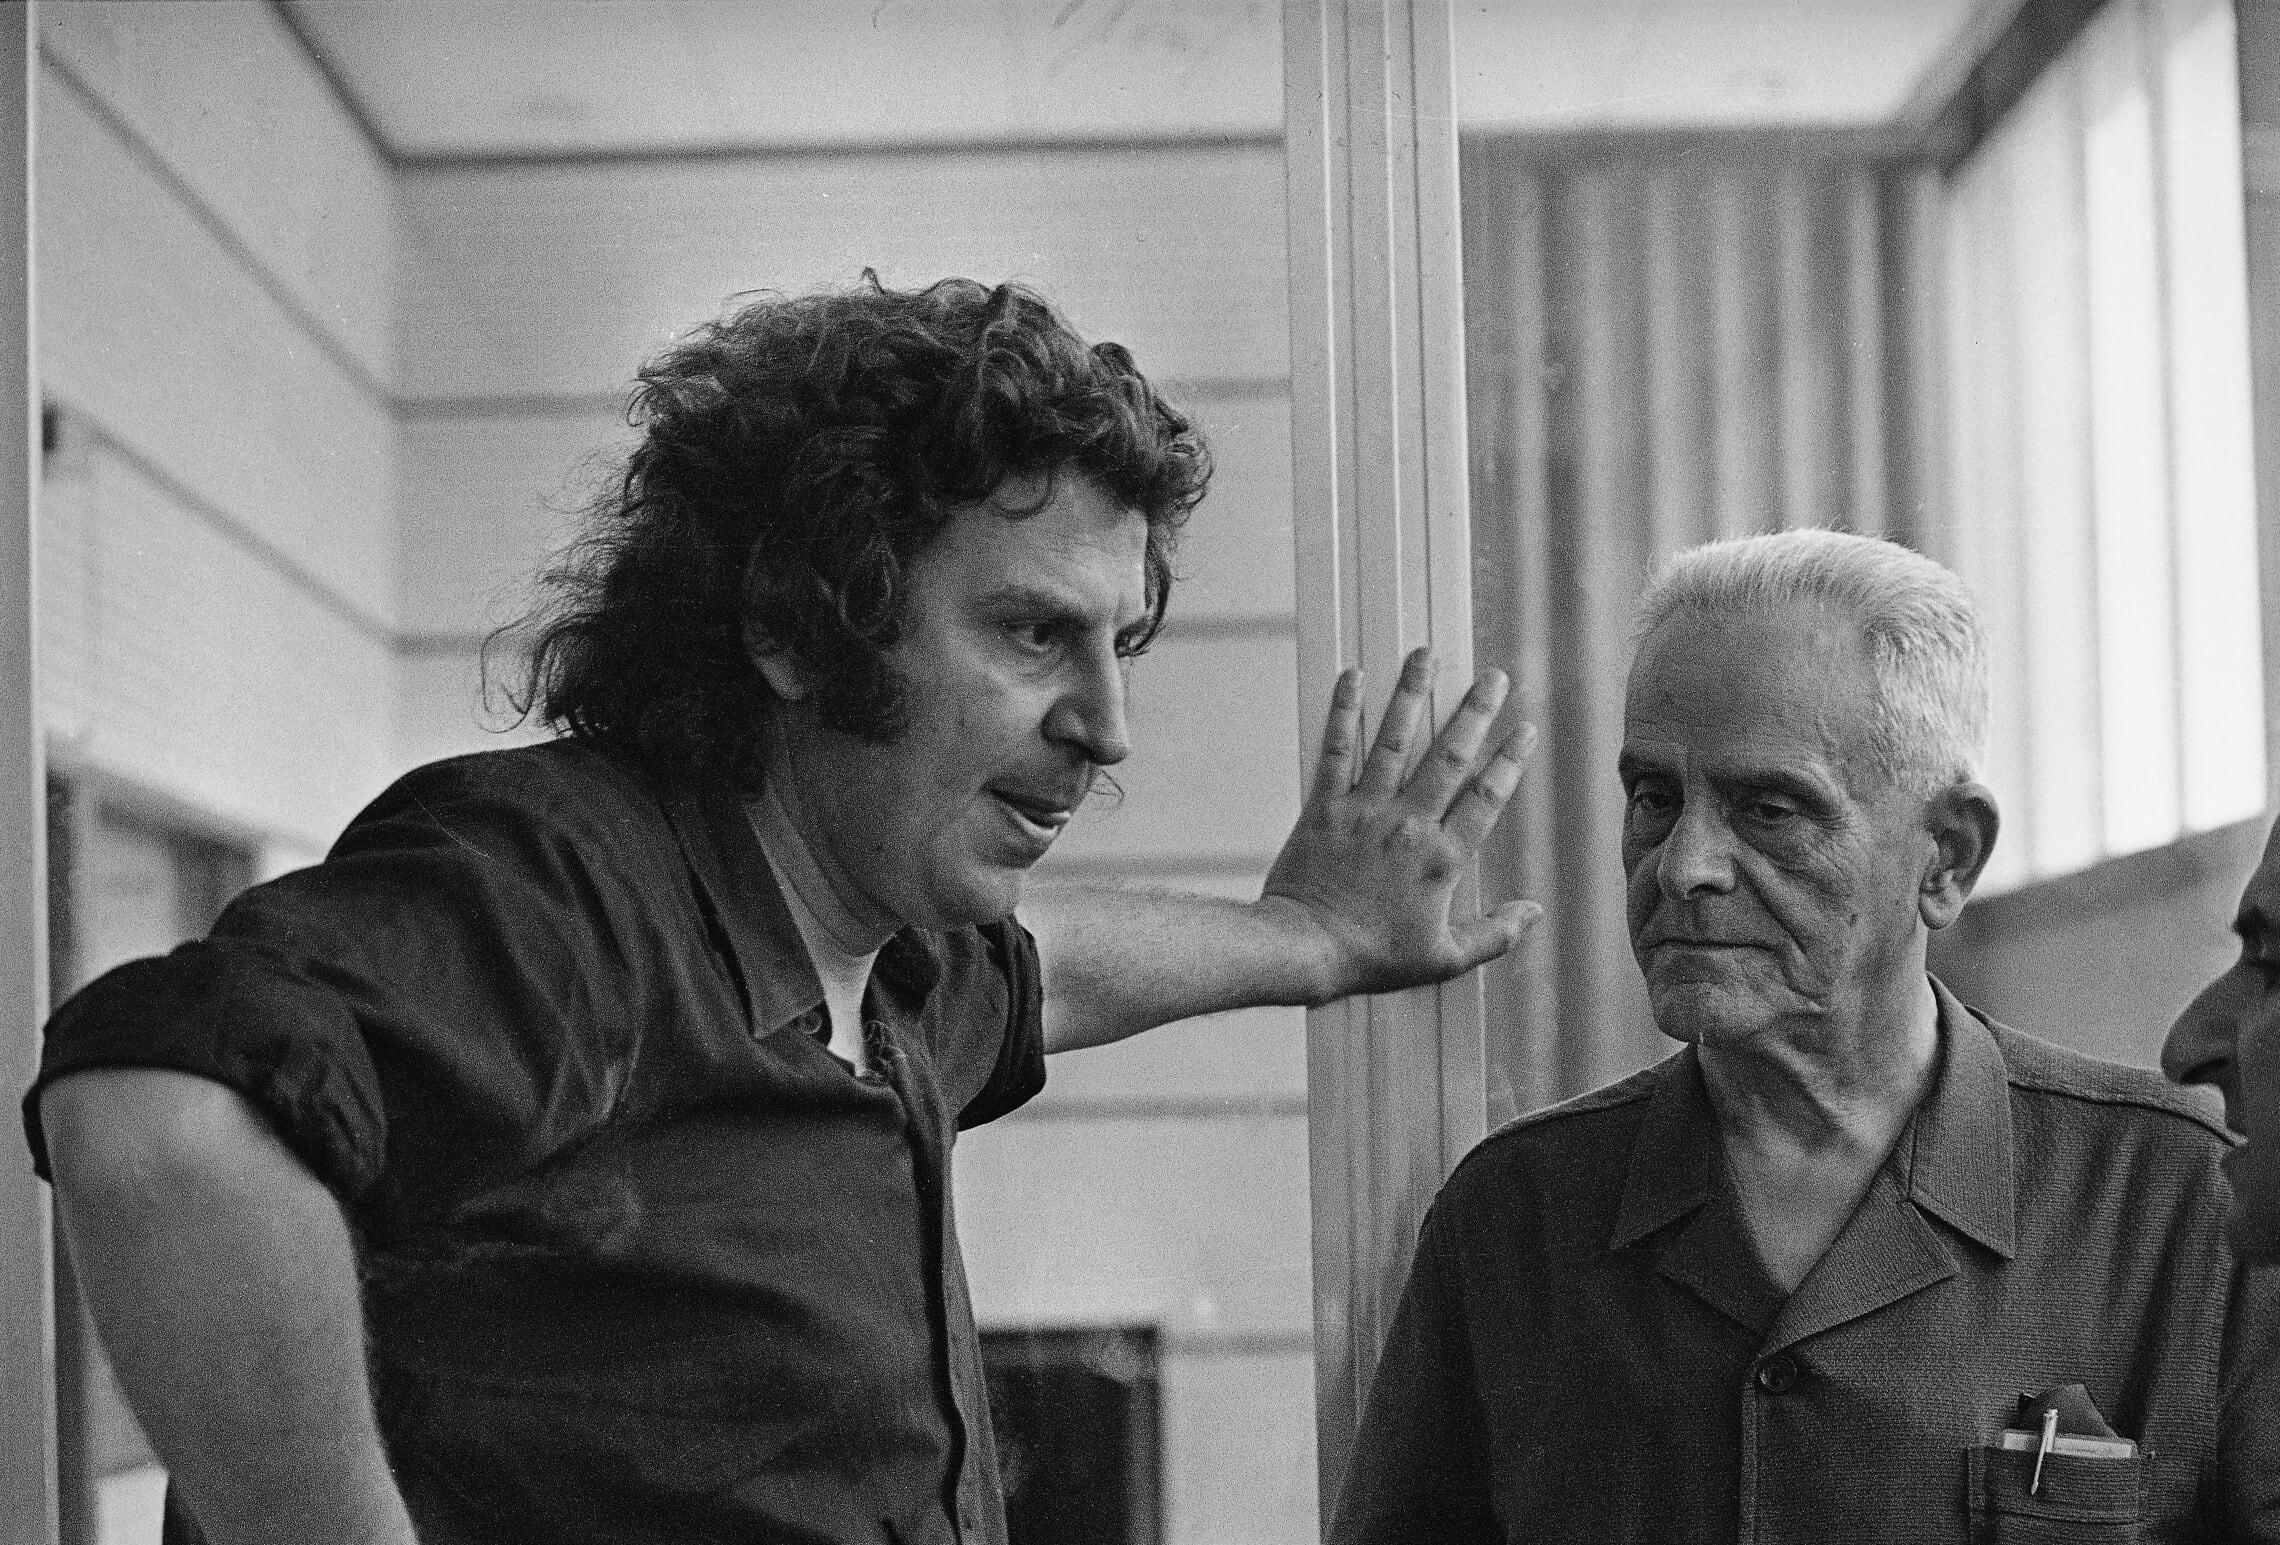 מיקיס תאודוראקיס, משמאל, עם אביו גריגוריס ב-1974 (צילום: AP Photo/Aristotle Saris)